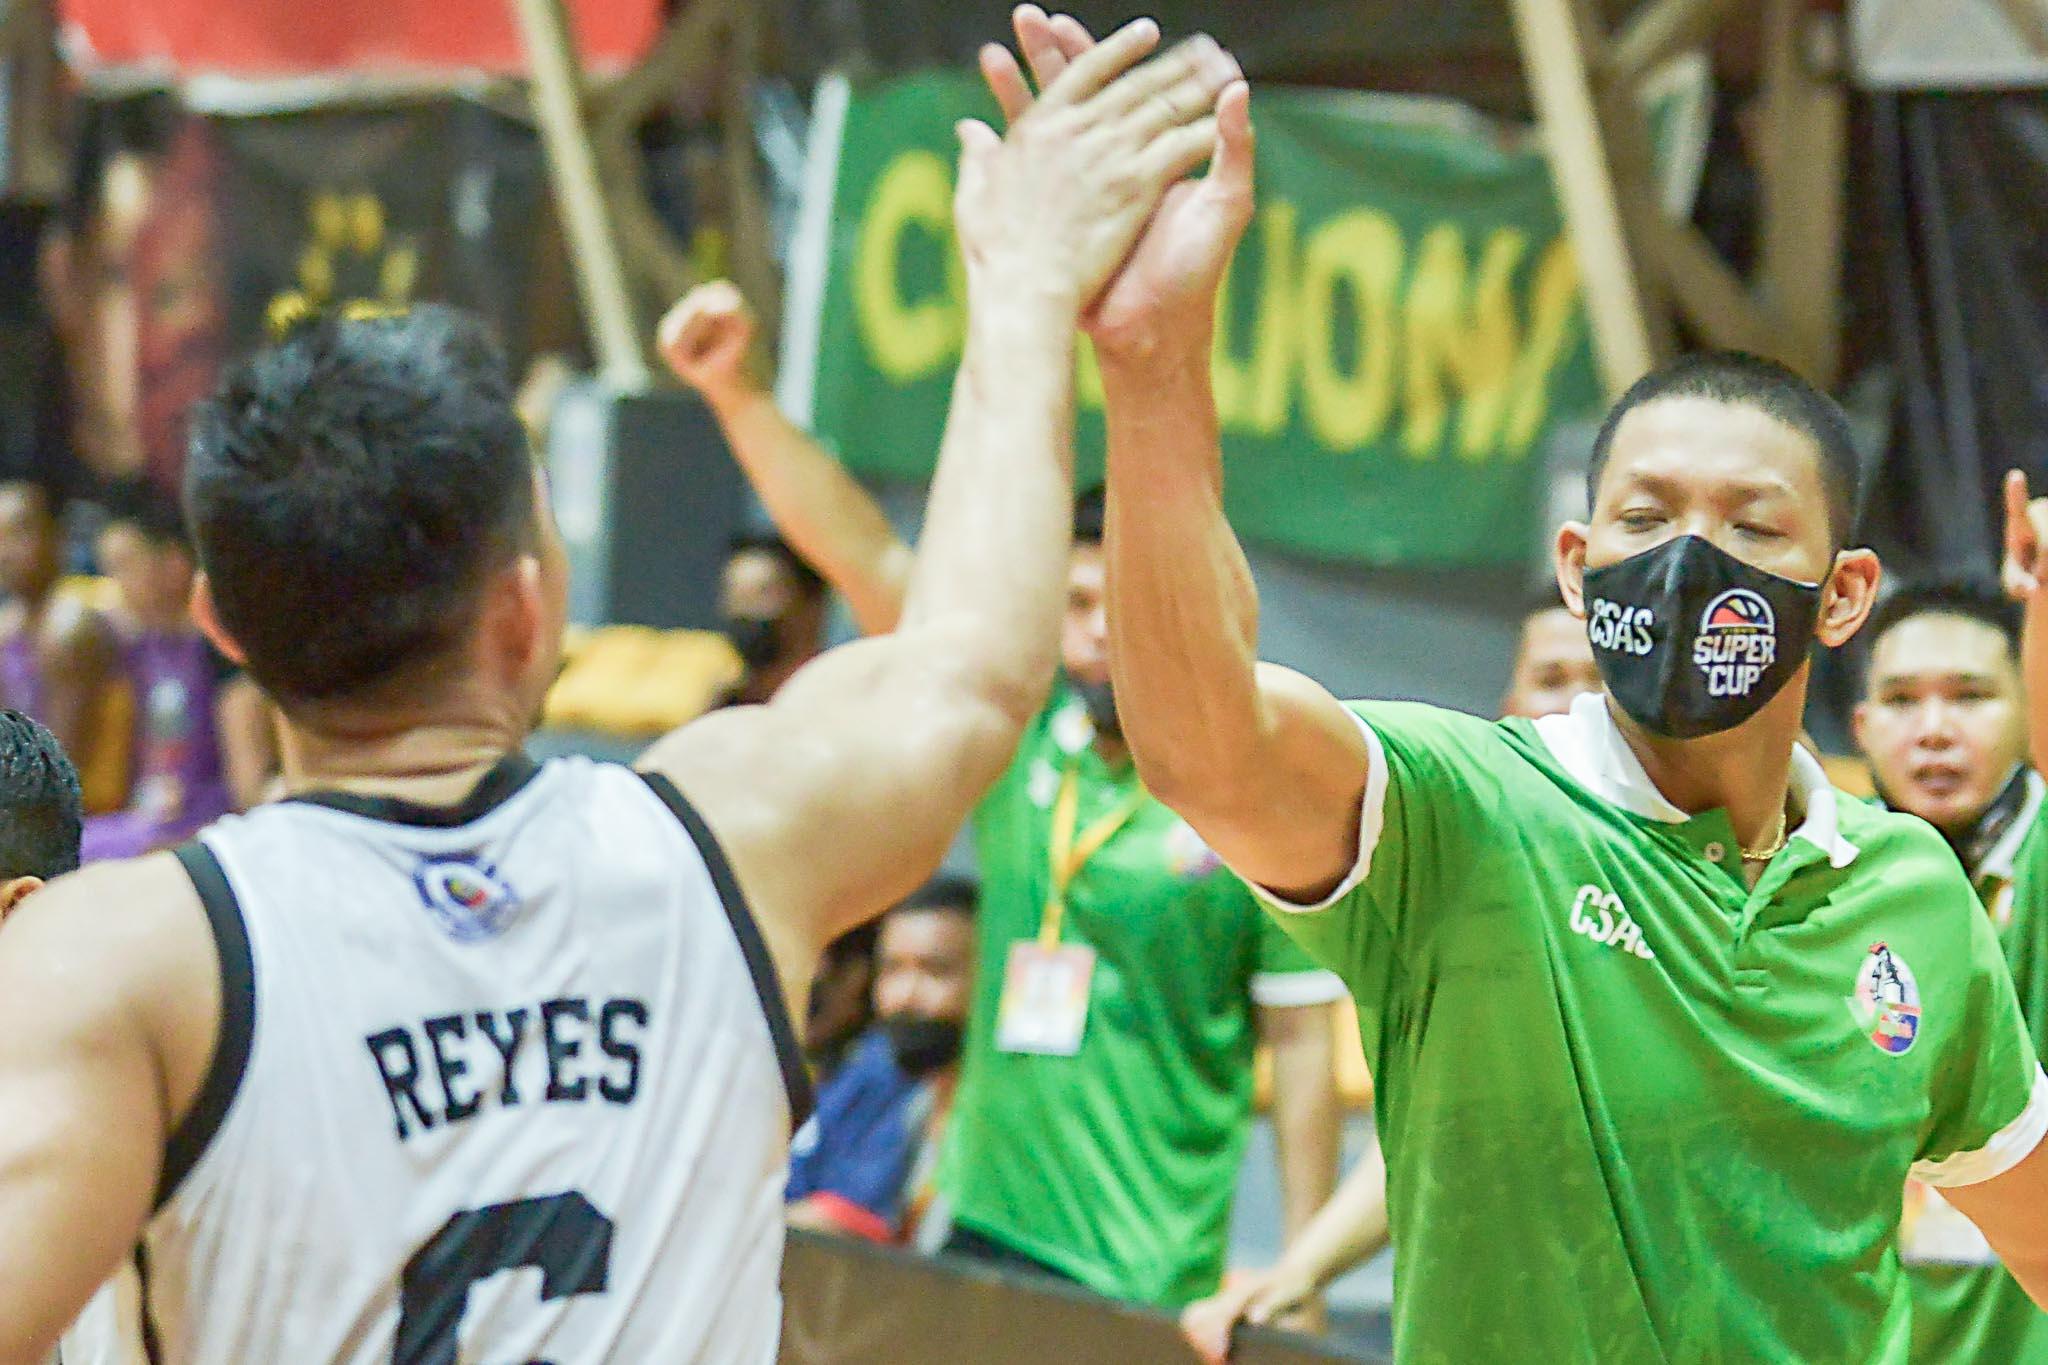 2021-Chooks-VisMin-Mindanao-SF-2-Roxas-vs-Zamboanga-City-Lester-Reyes-x-Eddie-Laure Sta. Ana helps boot out Zambo City, leads Roxas to VisMin-Mindanao Finals Basketball News VisMin Super Cup  - philippine sports news